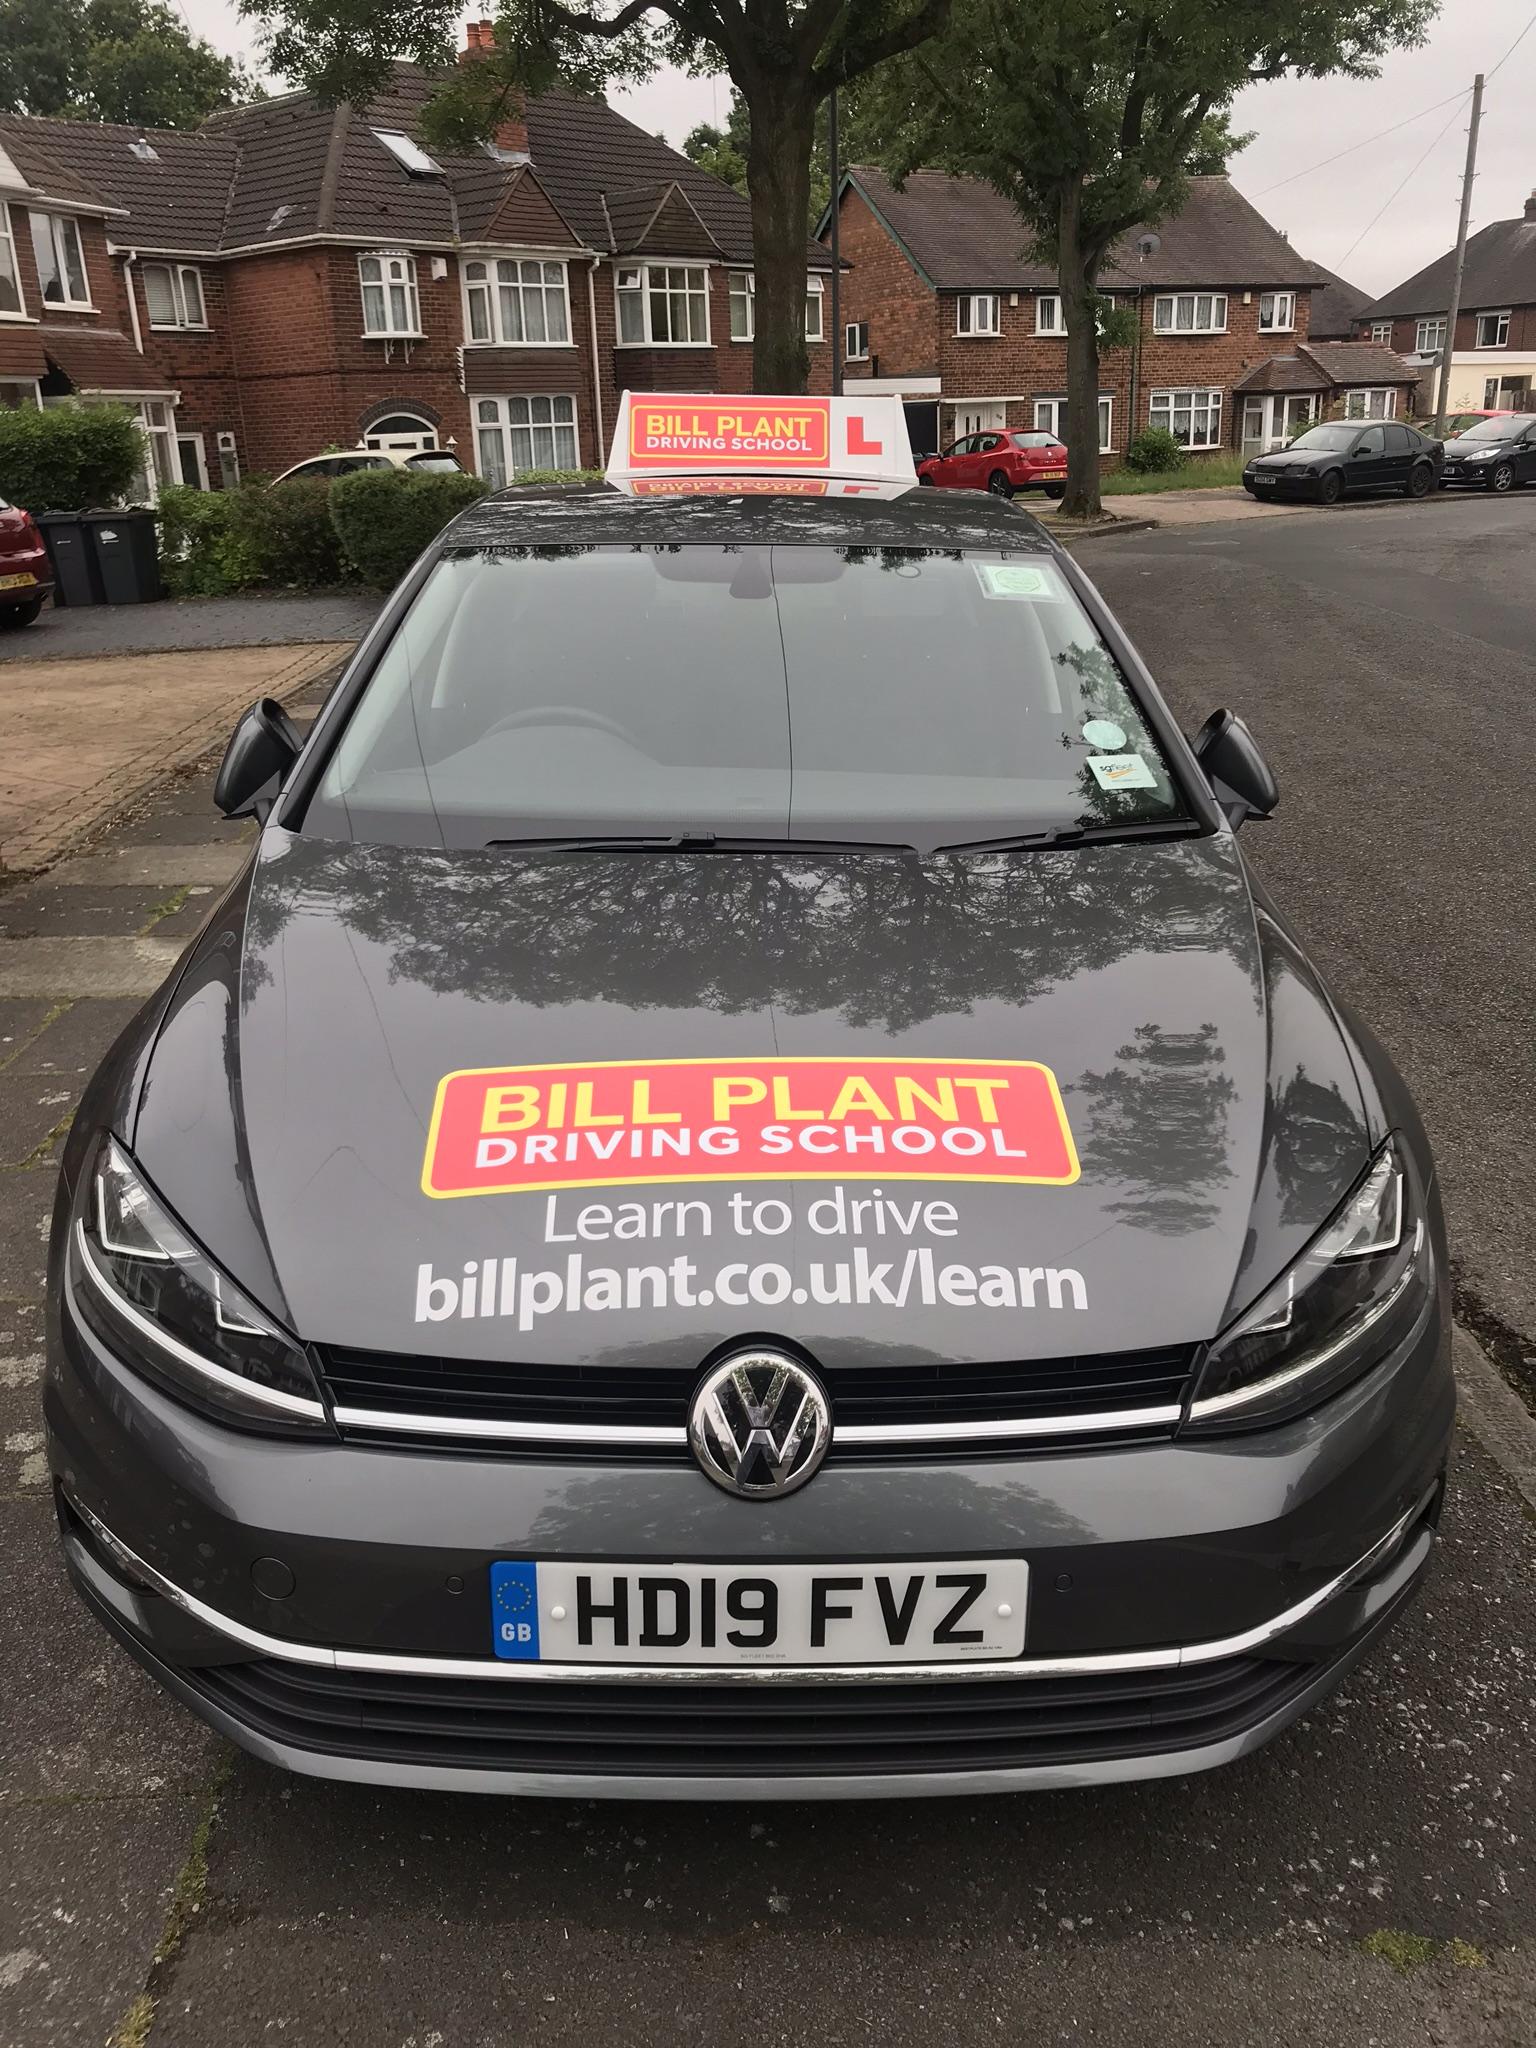 Bill Plant Driving School (Automatic)